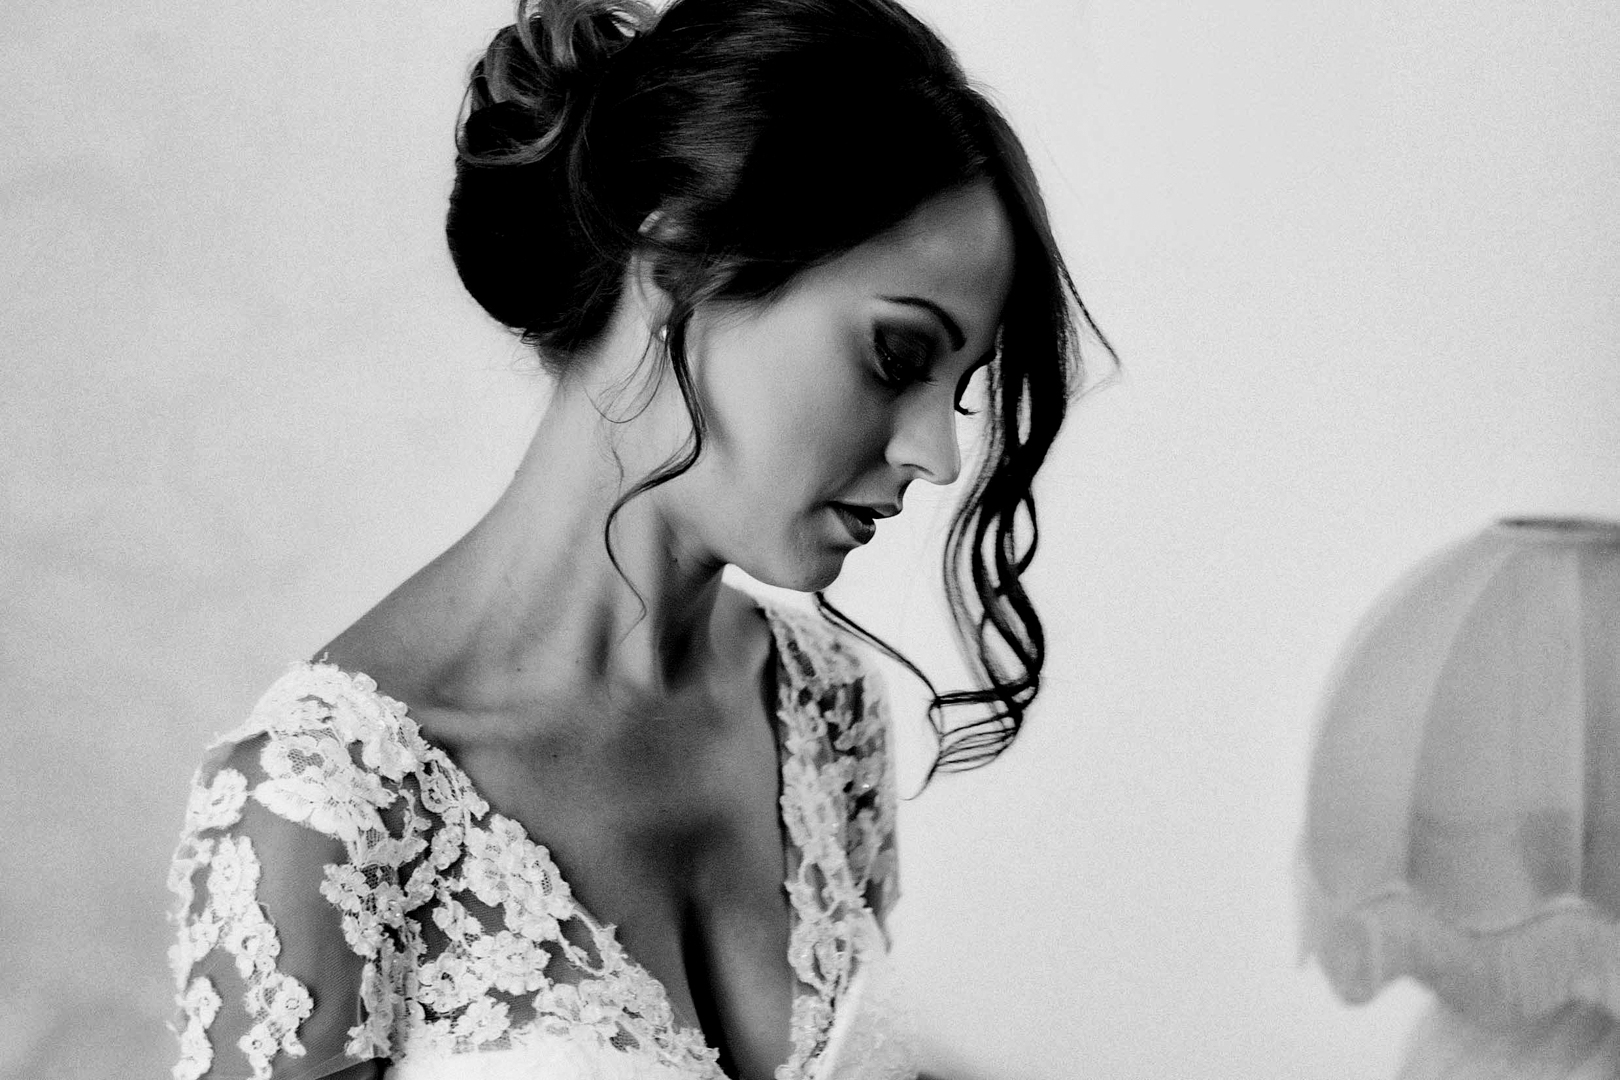 10 gianni-lepore-fashion-sposa-capelli-acconciatura